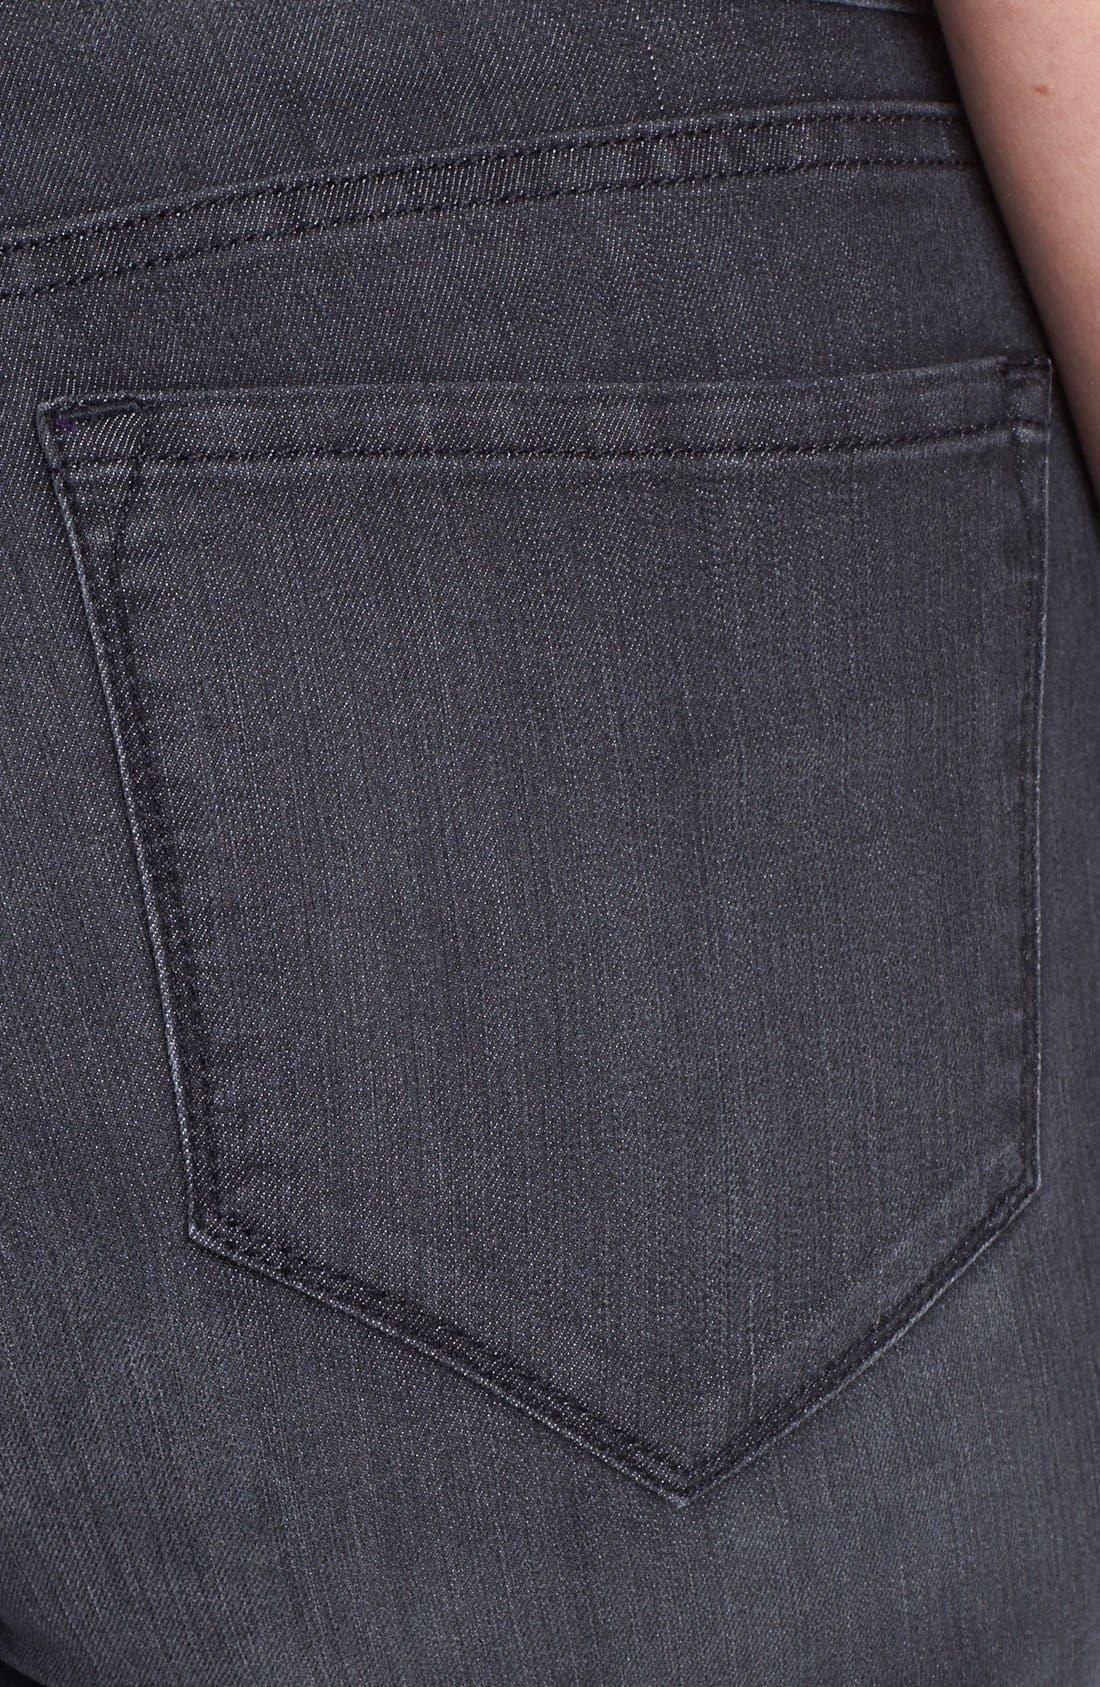 Alternate Image 3  - NYDJ 'Marilyn' Straight Leg Jeans (Plus Size)